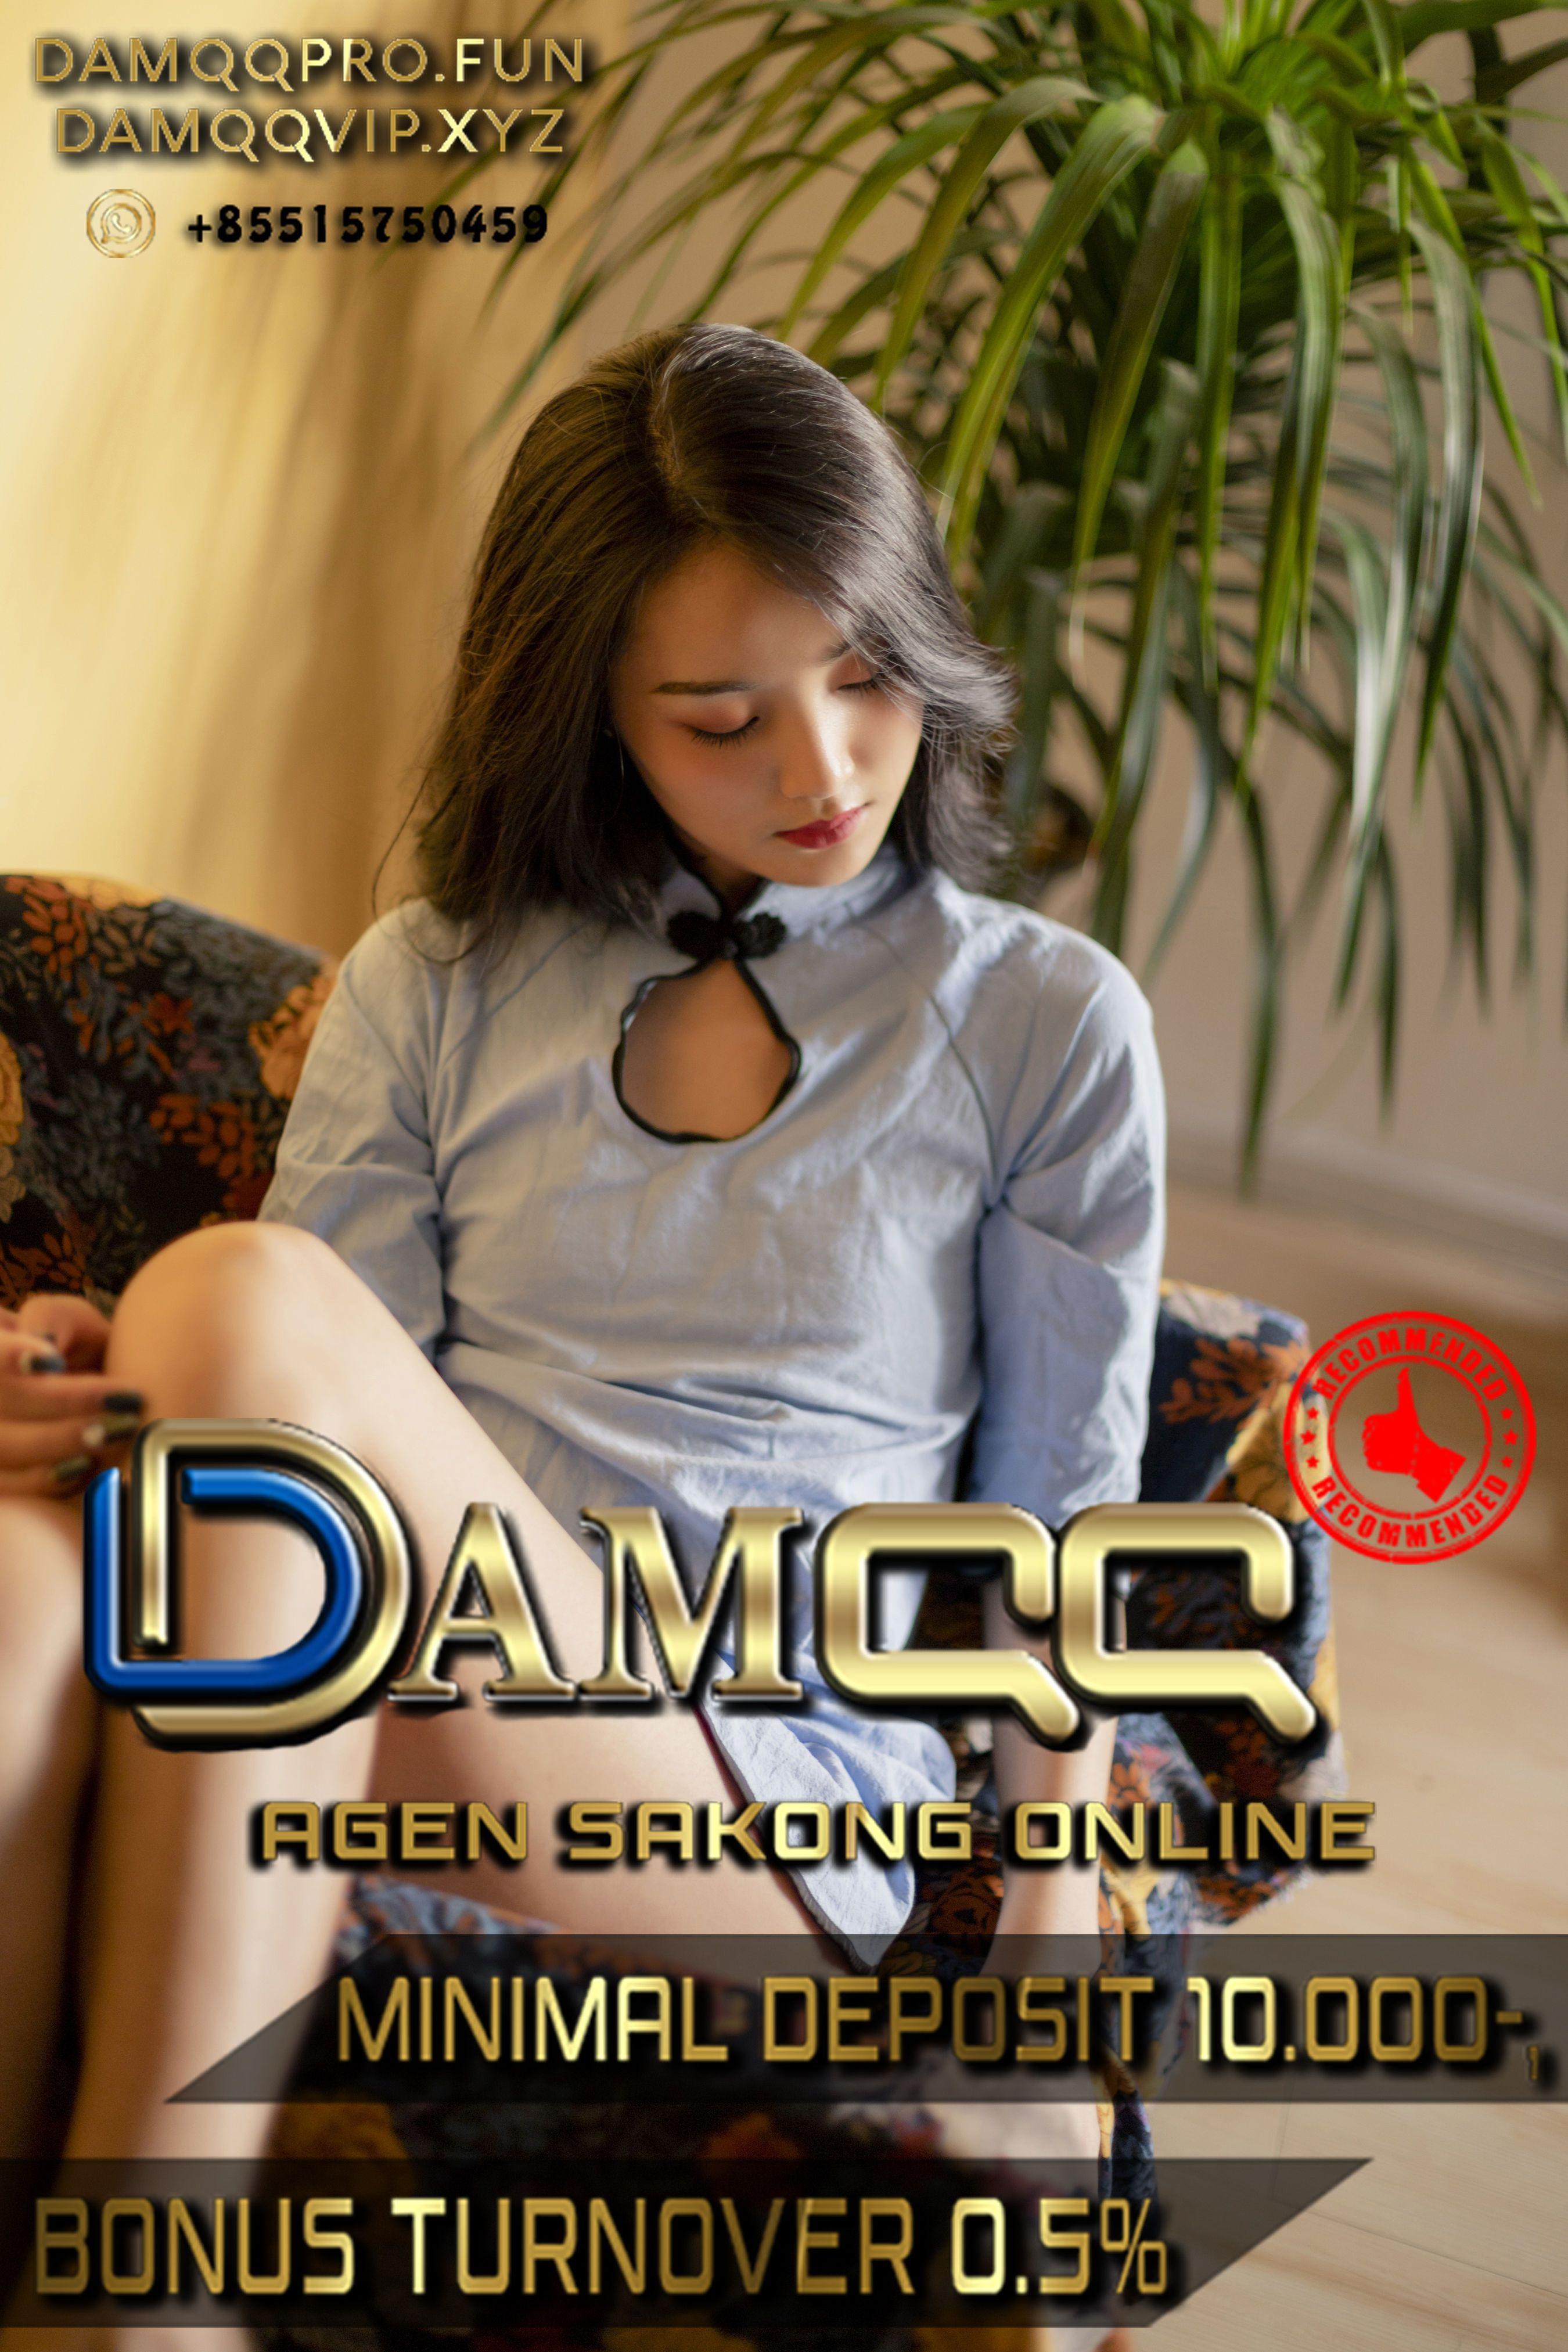 Sakong Online | Damqqpro | Damqqvip | Damqq Indonesia | Id